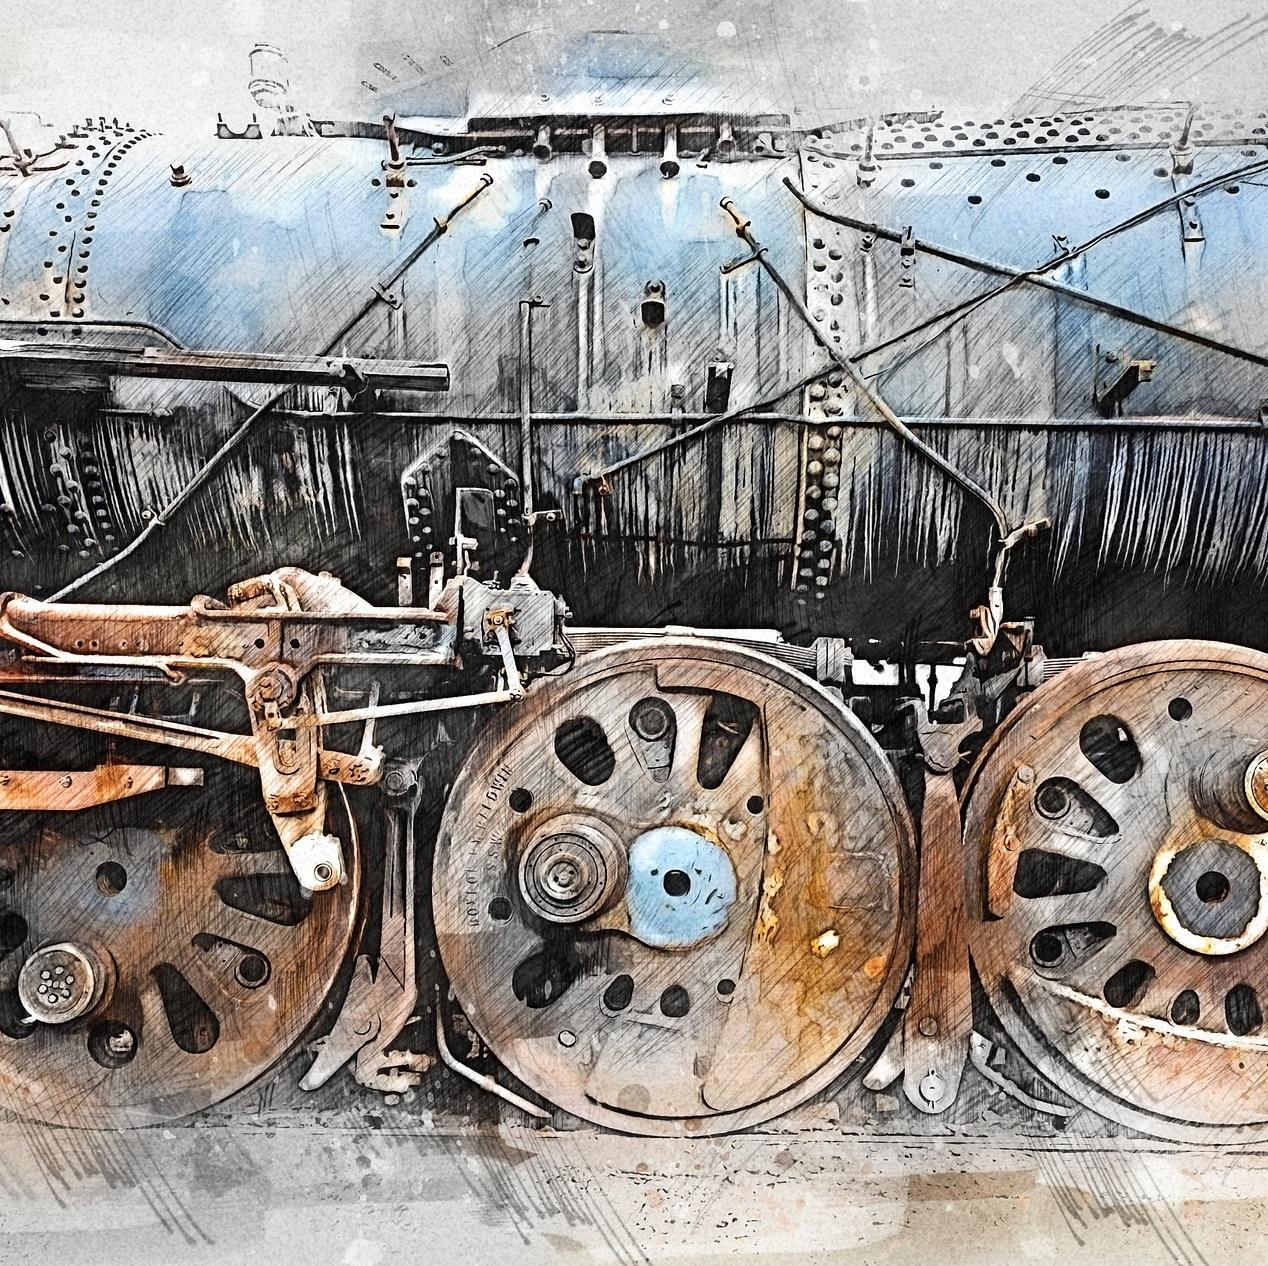 locomotive-4533082_1920